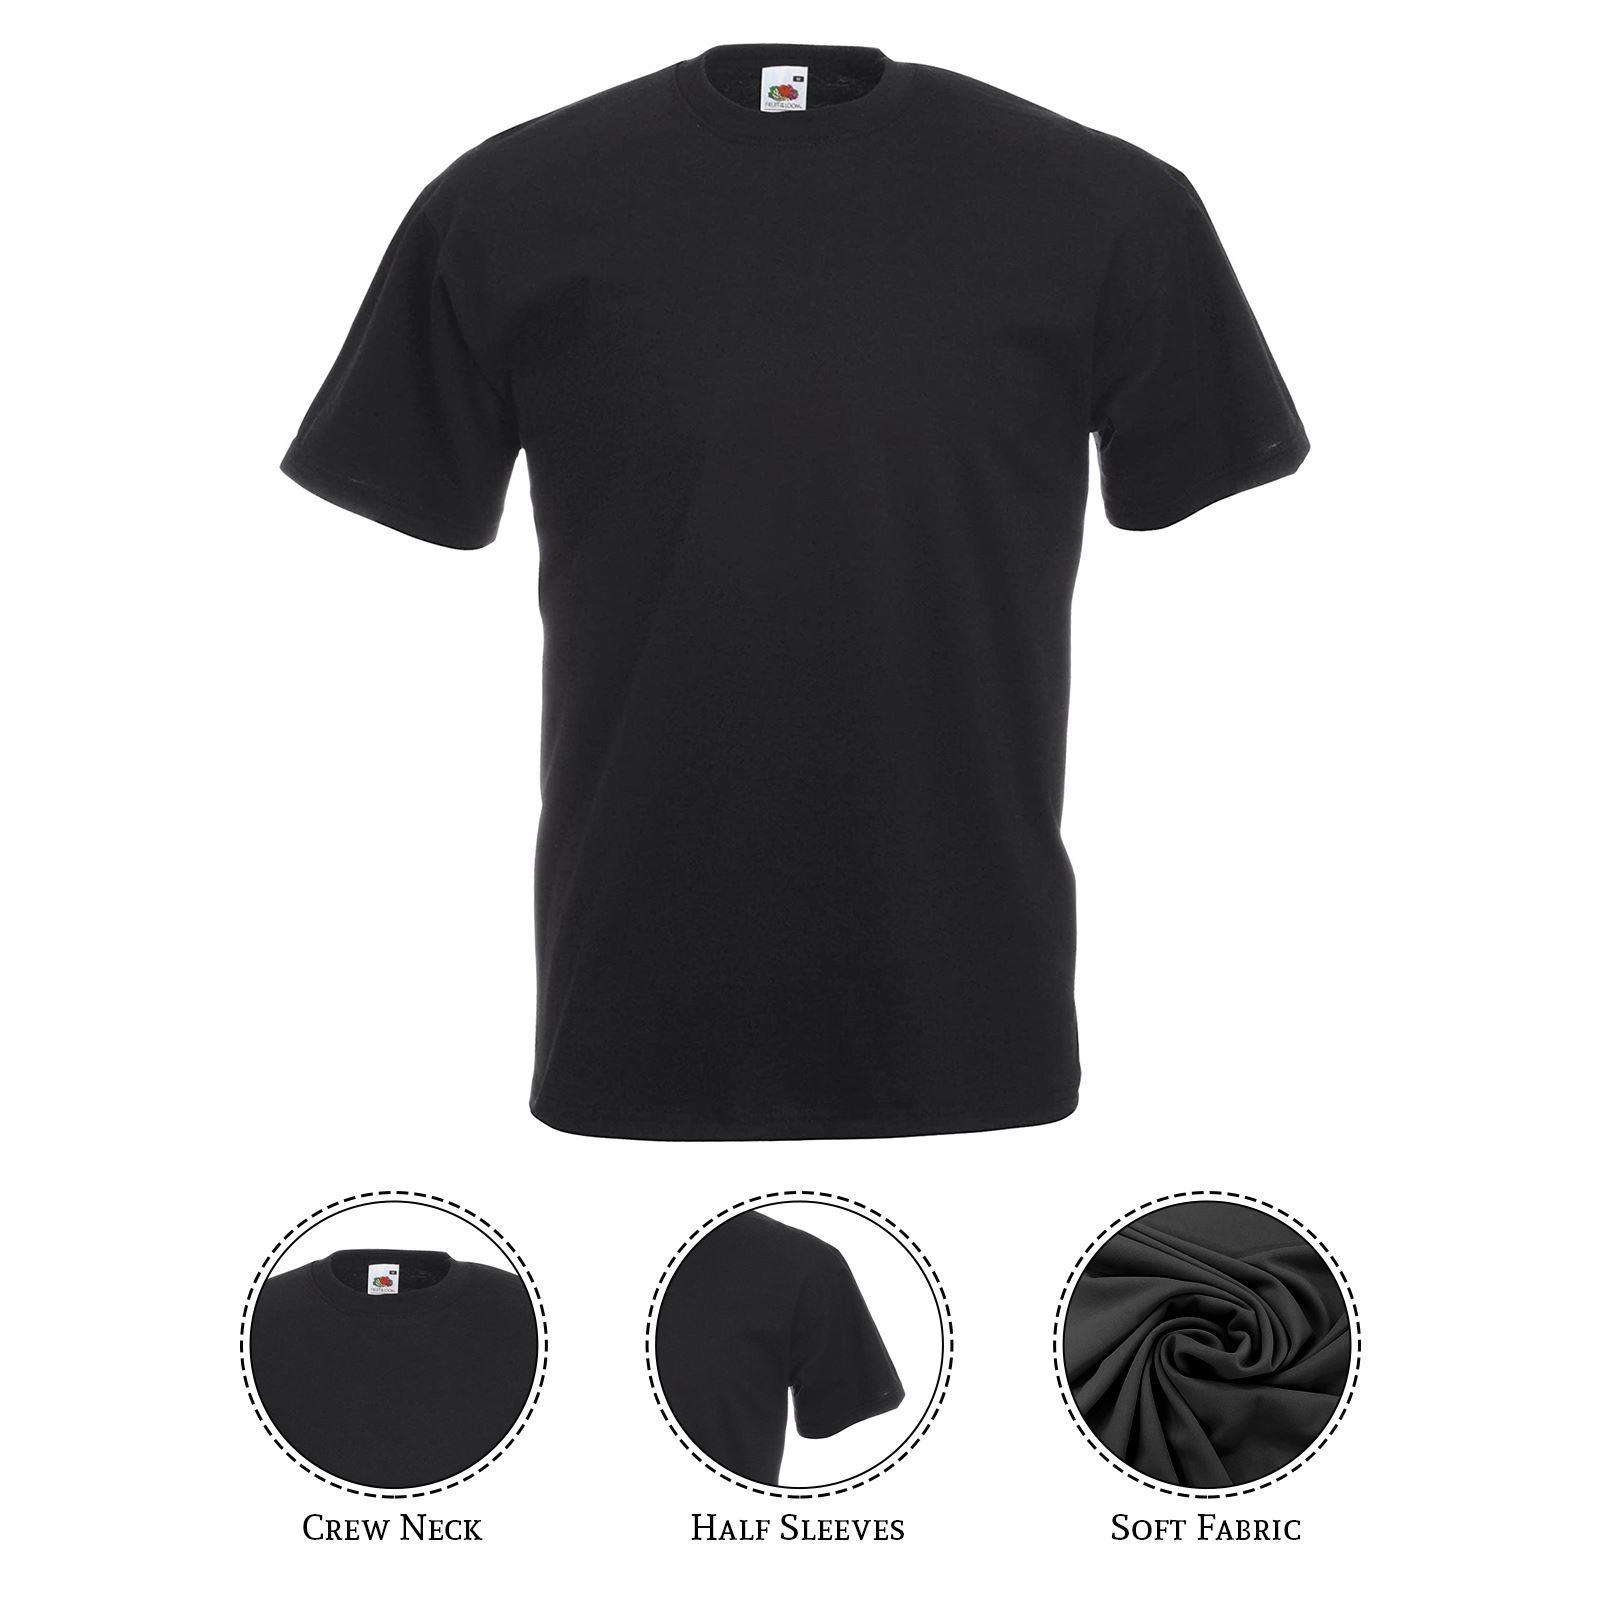 thumbnail 7 - Men-s-Fruit-Of-The-Loom-T-Shirt-Original-100-Cotton-Casual-Plain-Top-Tee